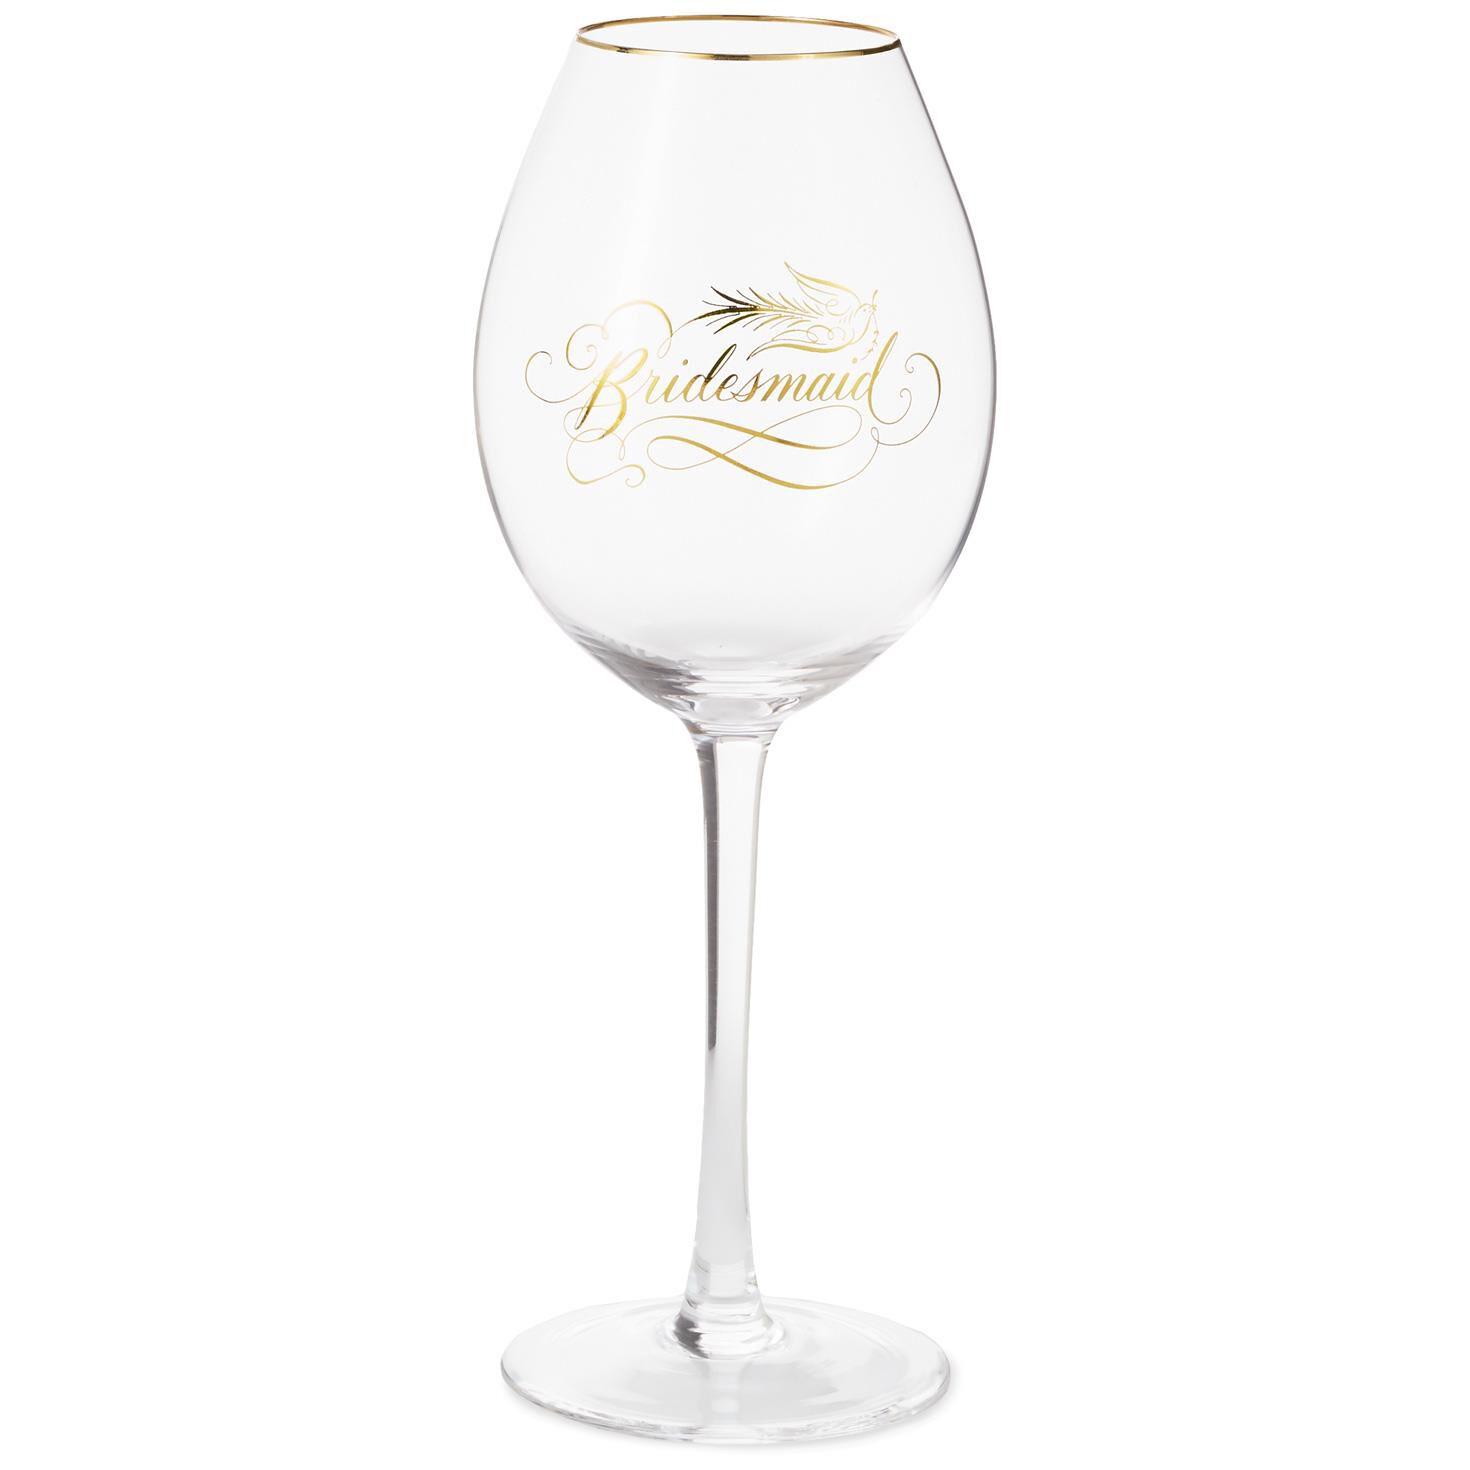 bridesmaid wine glass 16 oz wine glasses hallmark